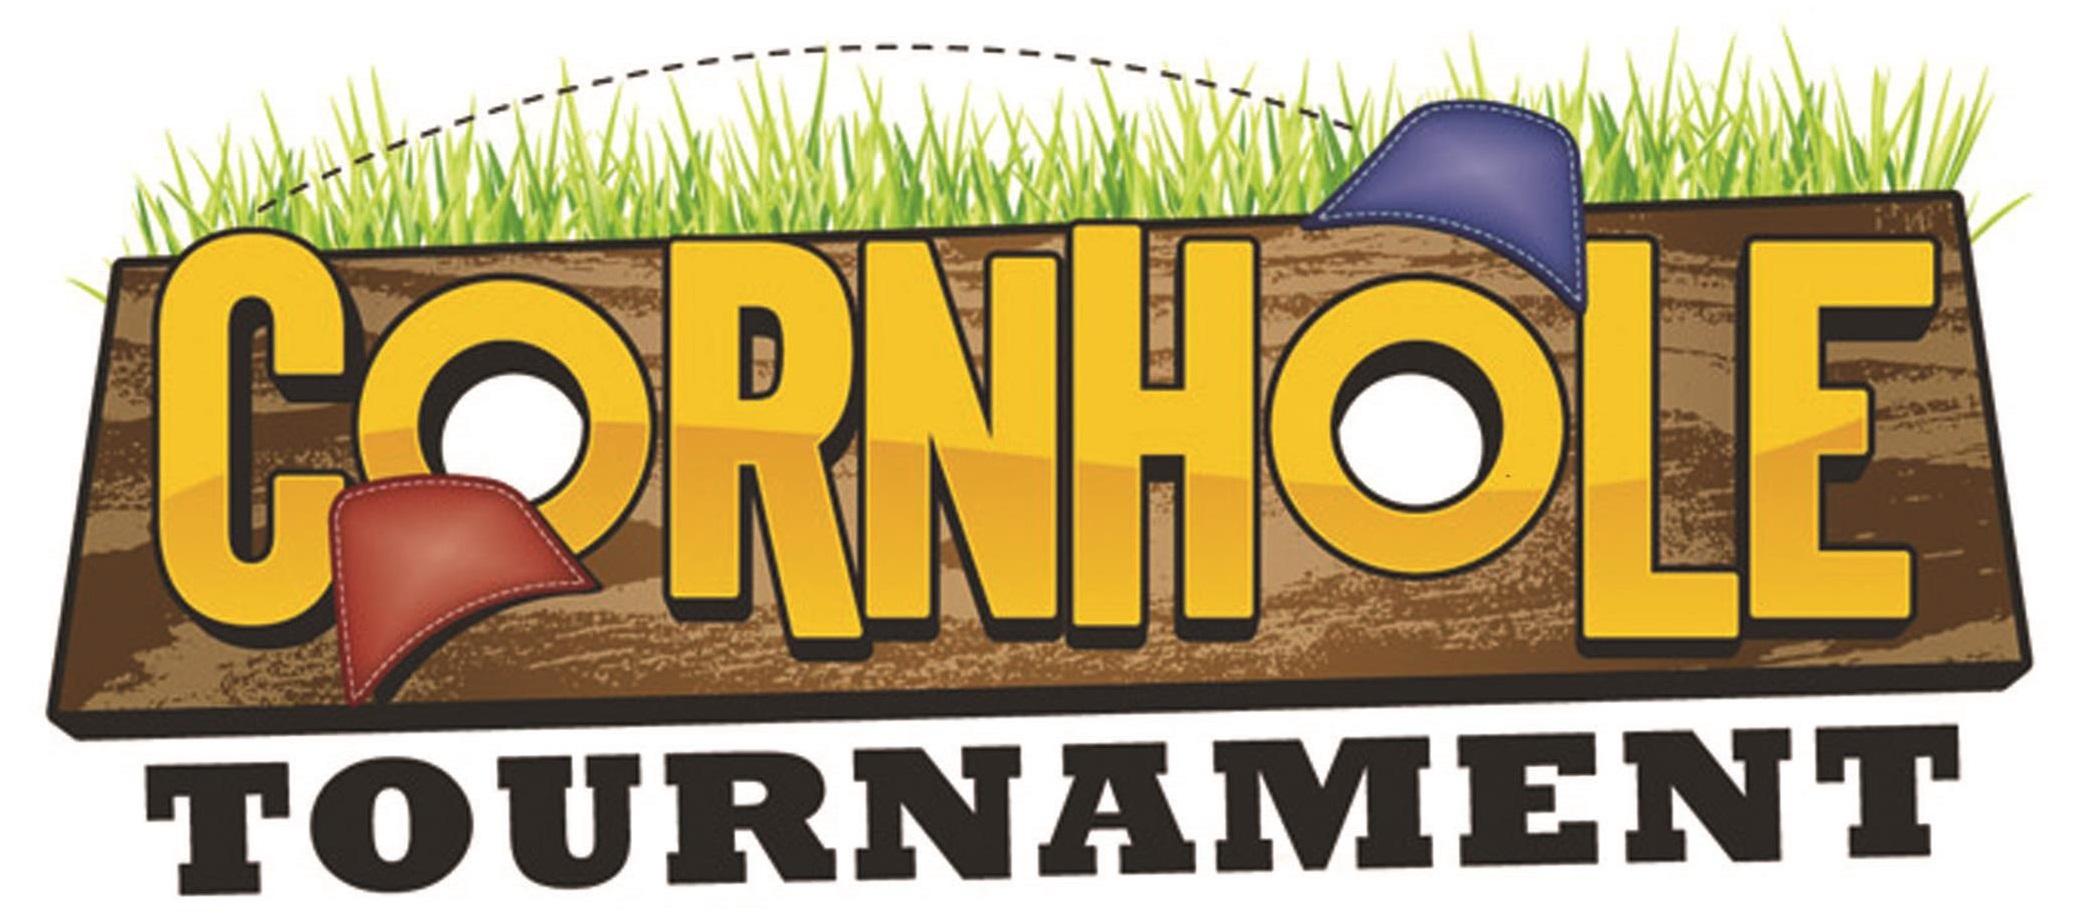 Cornhole-Tournament.jpg